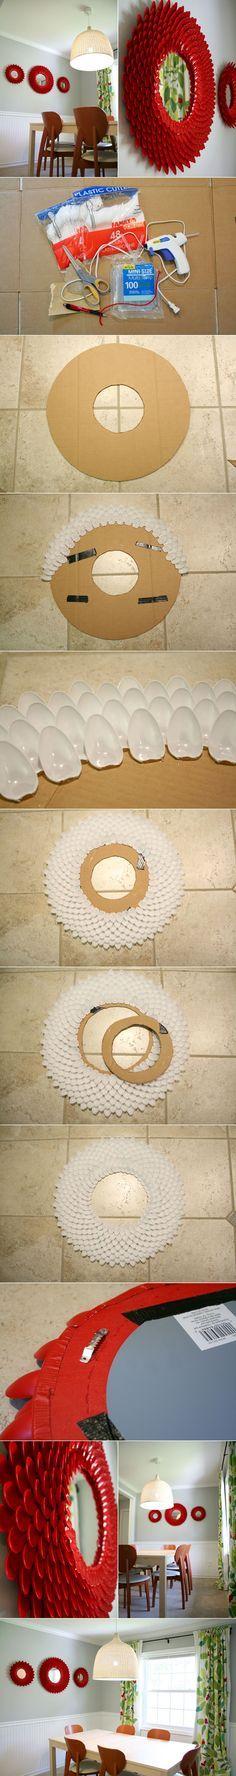 DIY Decorative Chrysanthemum Mirror with Plastic Spoons   www.FabArtDIY.com LIKE Us on Facebook ==> https://www.facebook.com/FabArtDIY